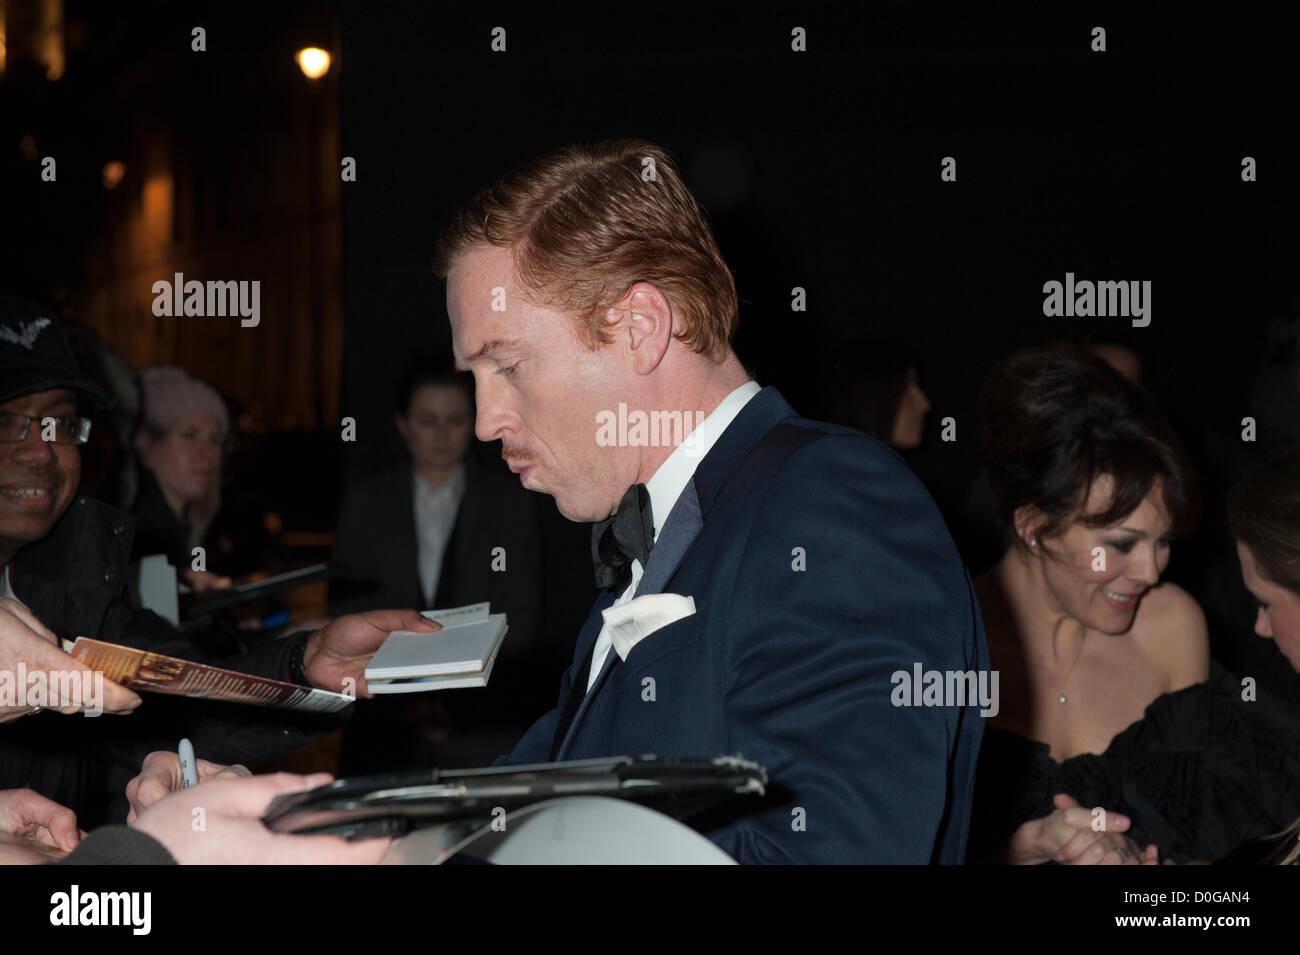 Damian Lewis at Evening Standard Theatre Awards 2012, The Savoy, London 25th November 2012 British actor signing - Stock Image